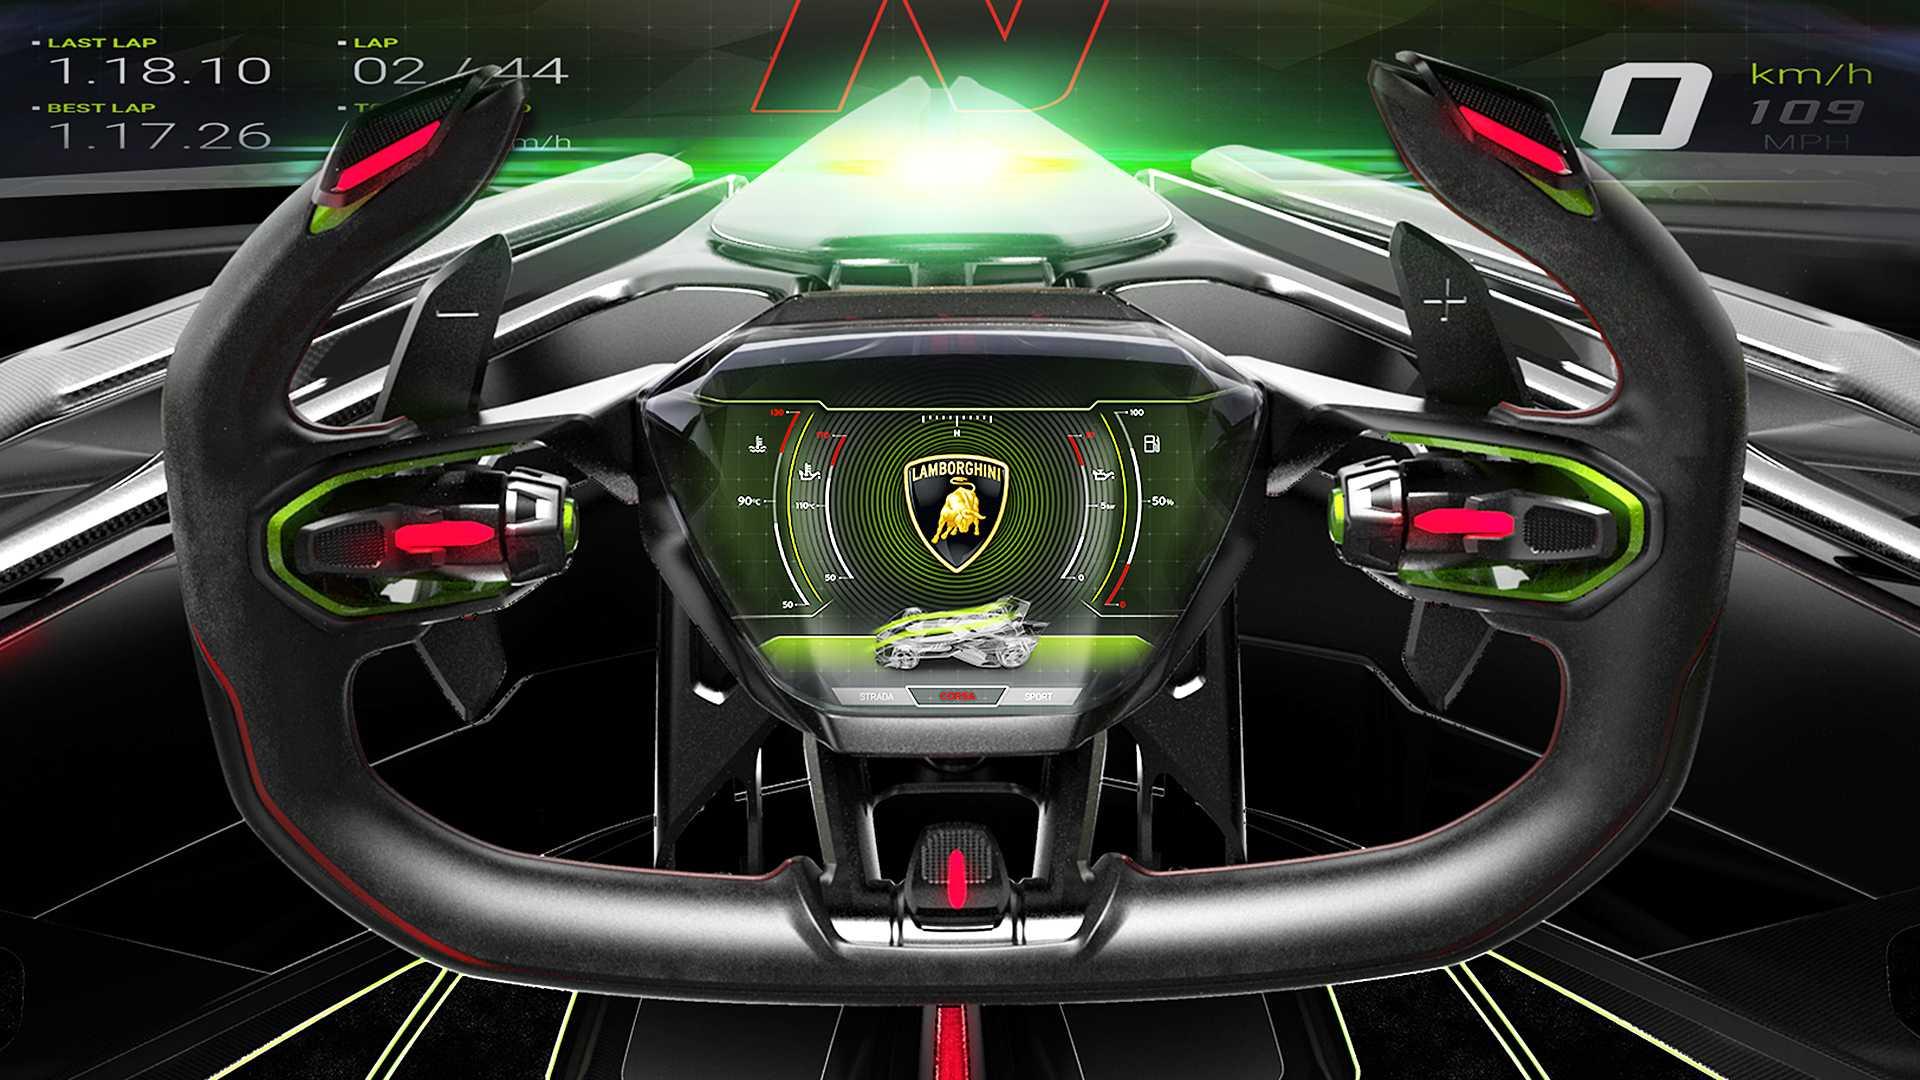 Wild Lamborghini V12 Vision GT concept revealed